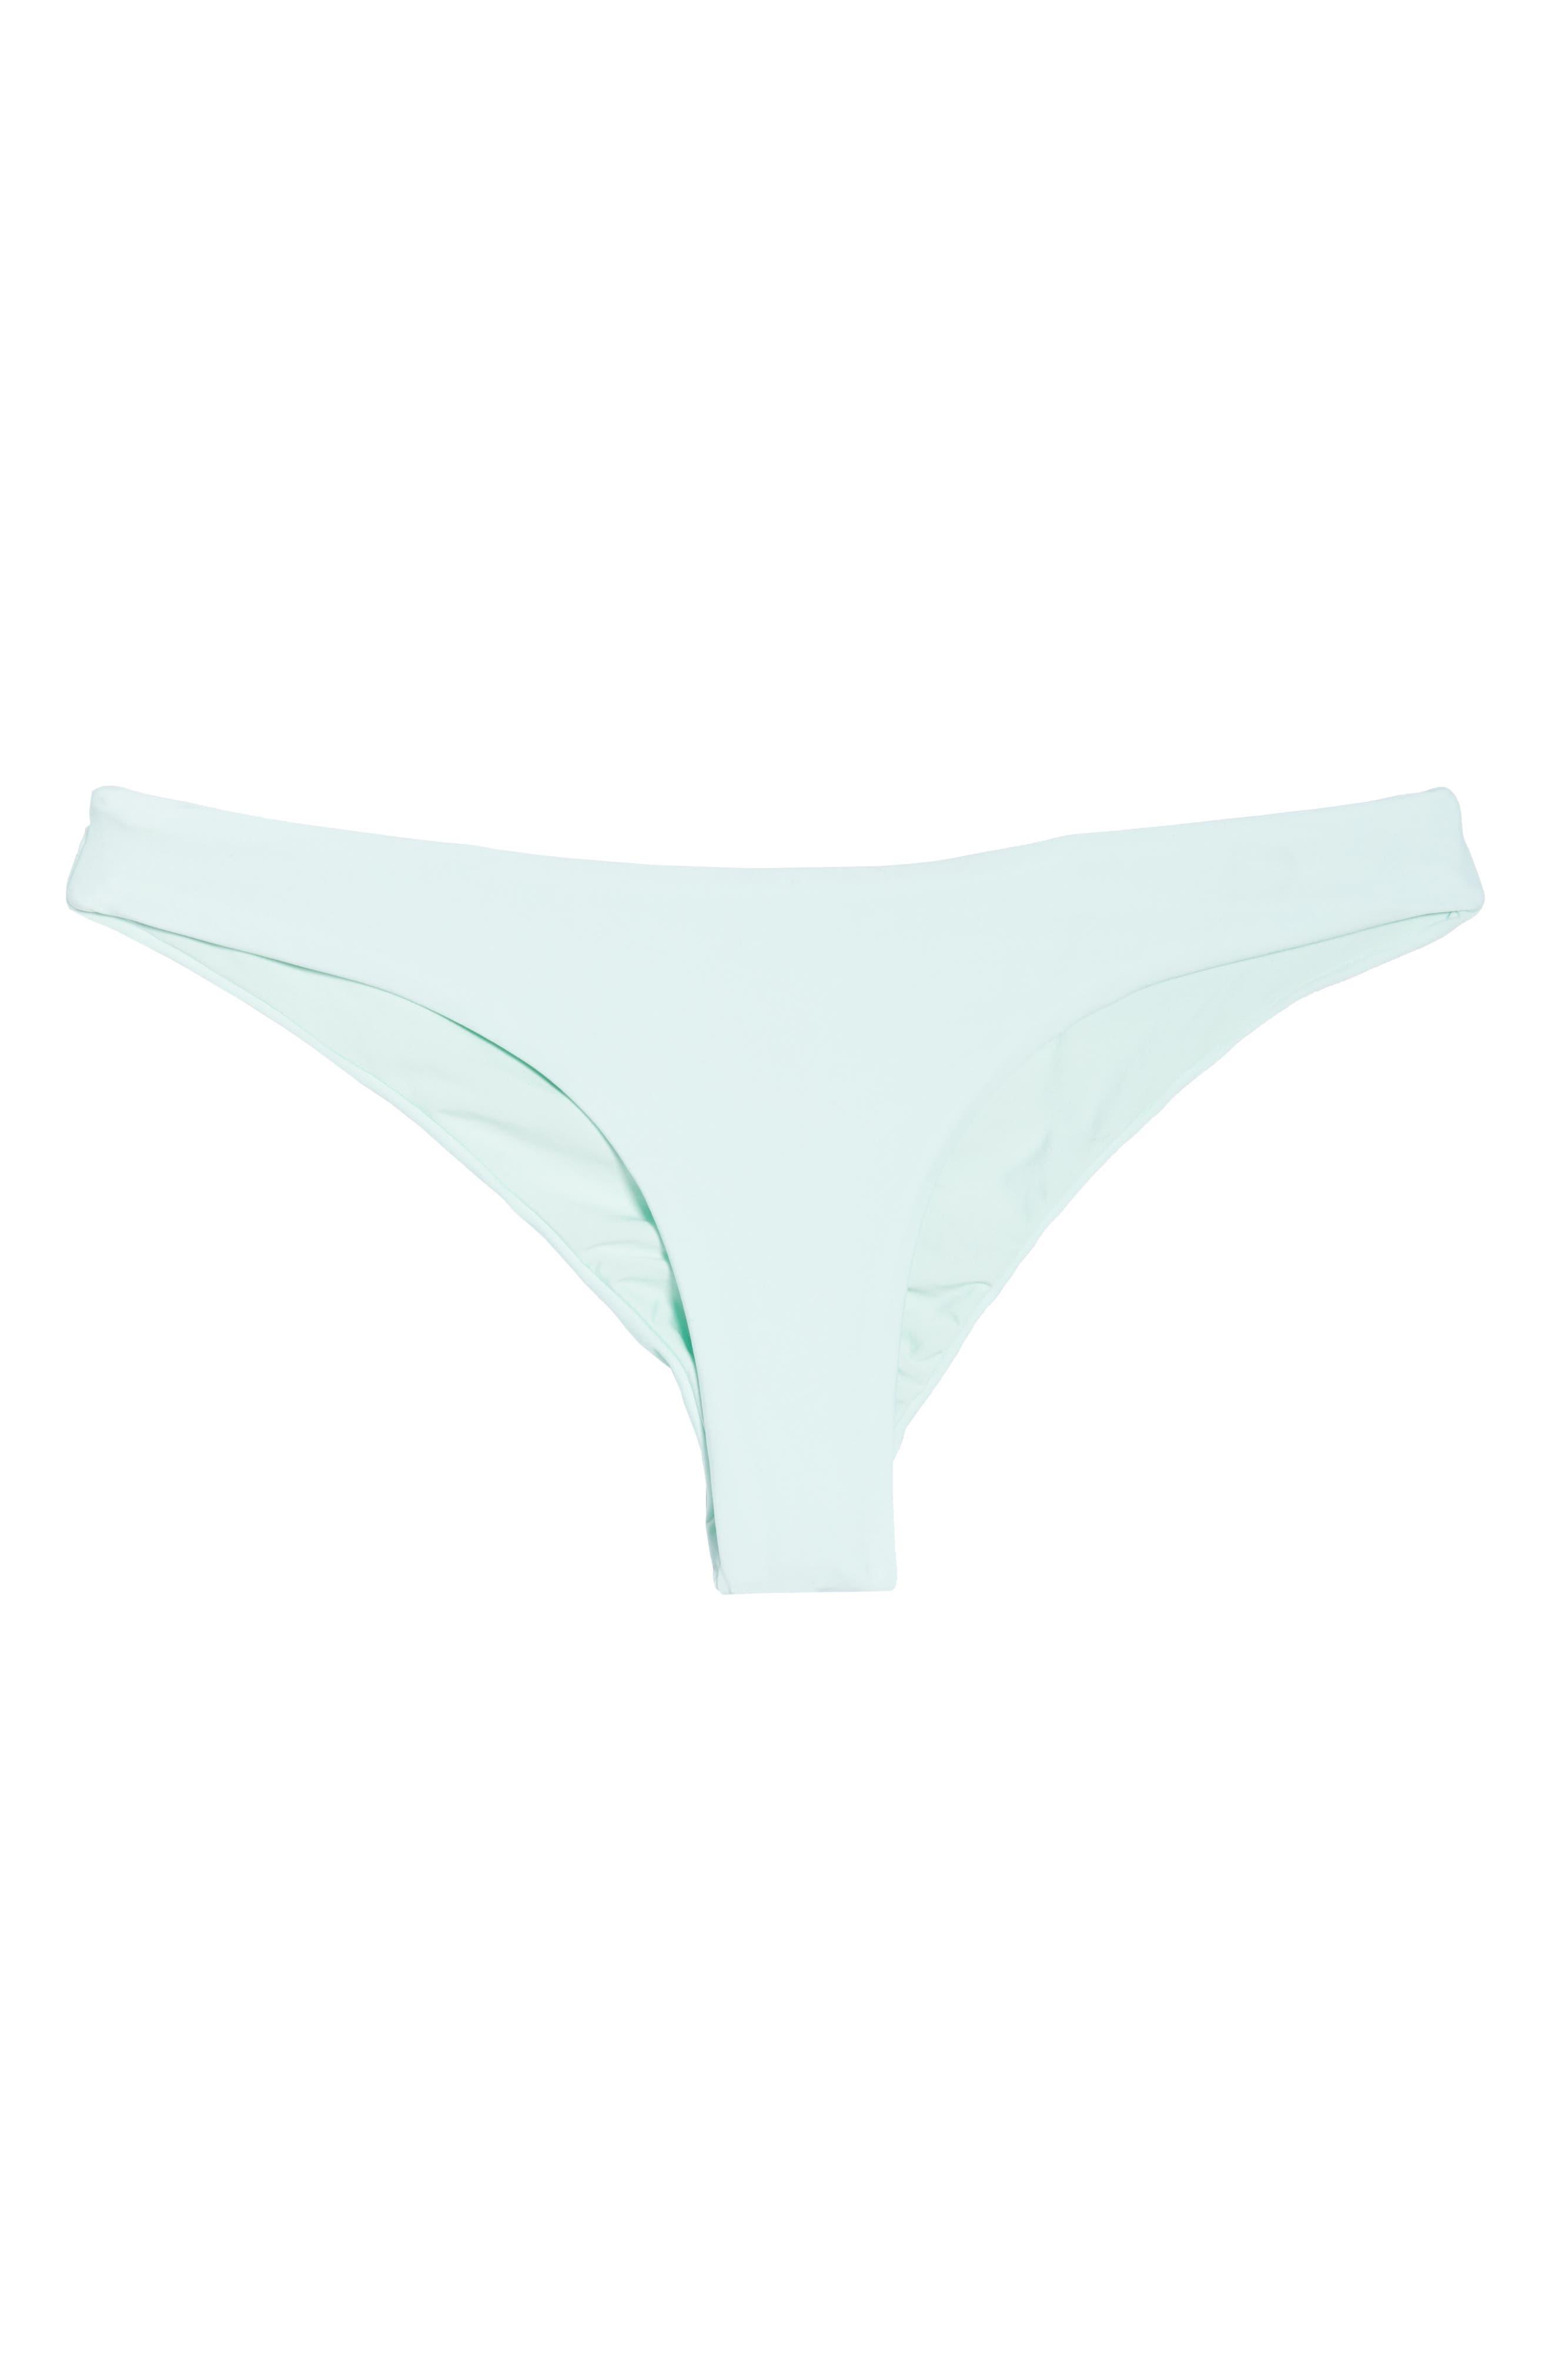 Ruched Bikini Bottoms,                             Alternate thumbnail 7, color,                             400